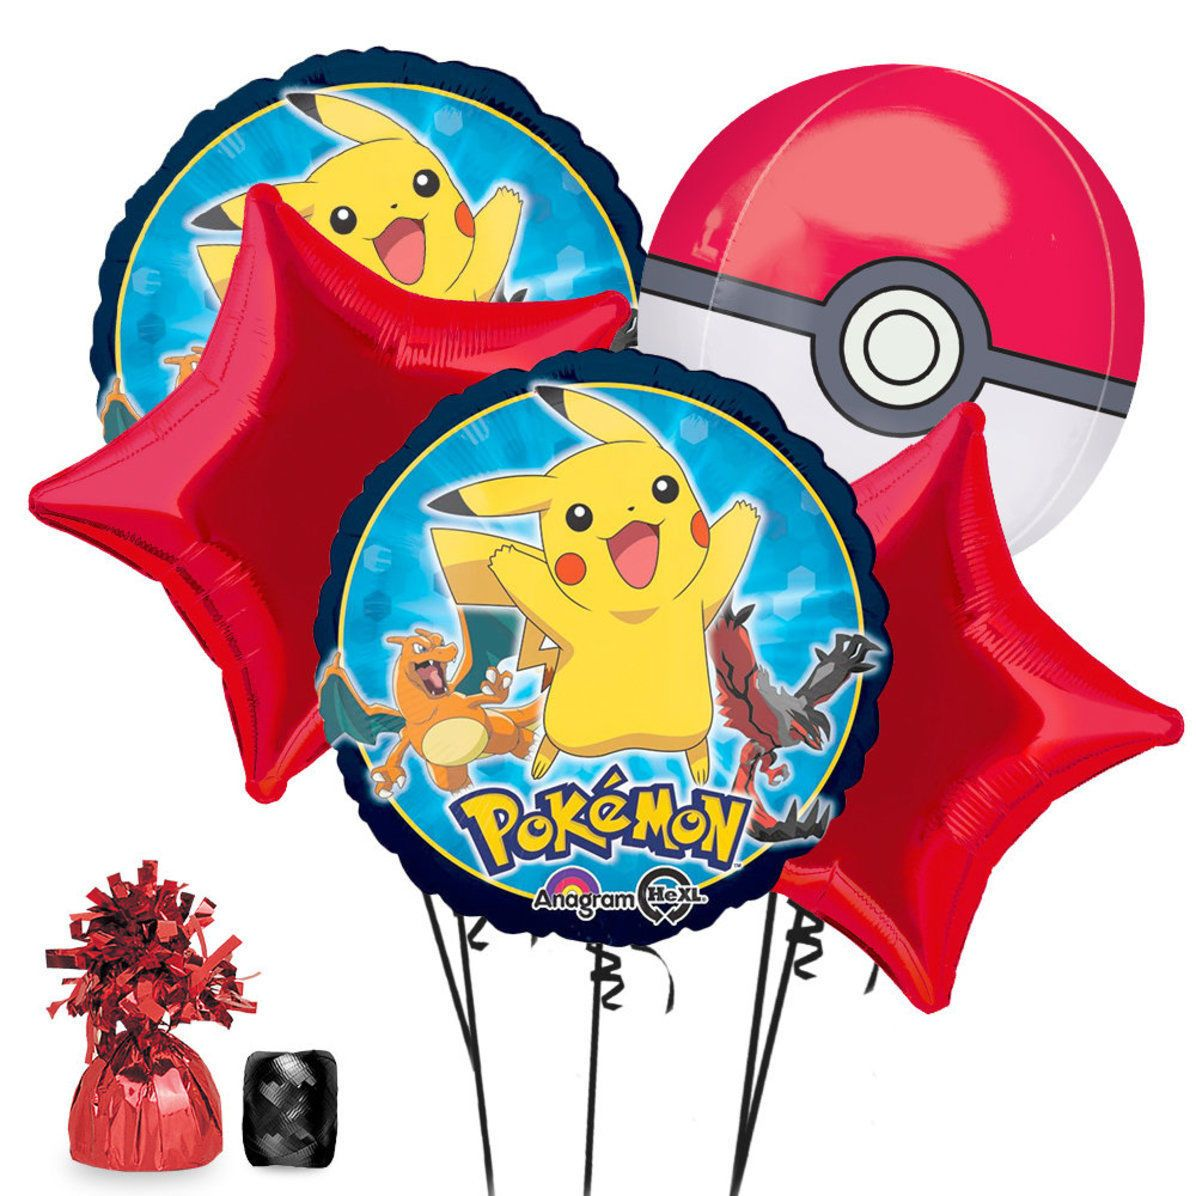 Details about Pikachu Pokemon PokeBall Foil Bouquet Balloon.